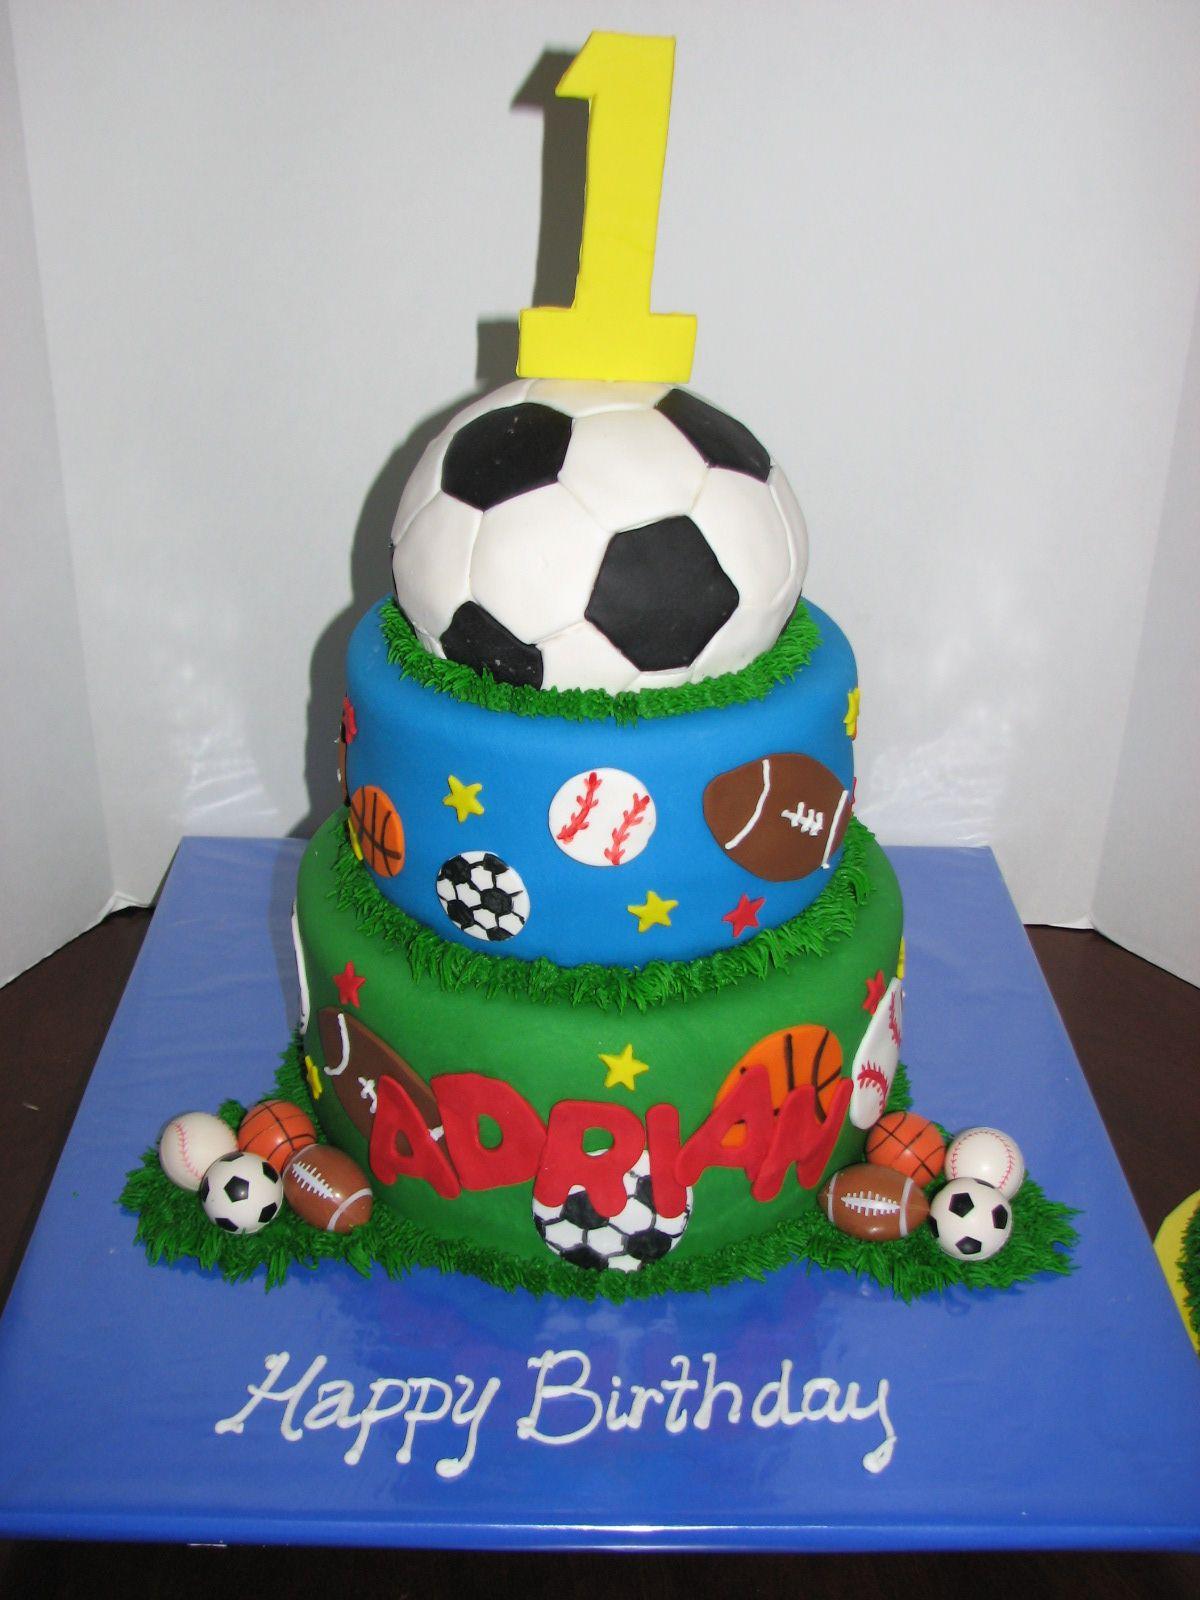 birthday cakes for boys with easy recipes sports cake cake by jennifer leonard cakesdecor sports cake sports cakes for birthdays cleveland dayton wedding